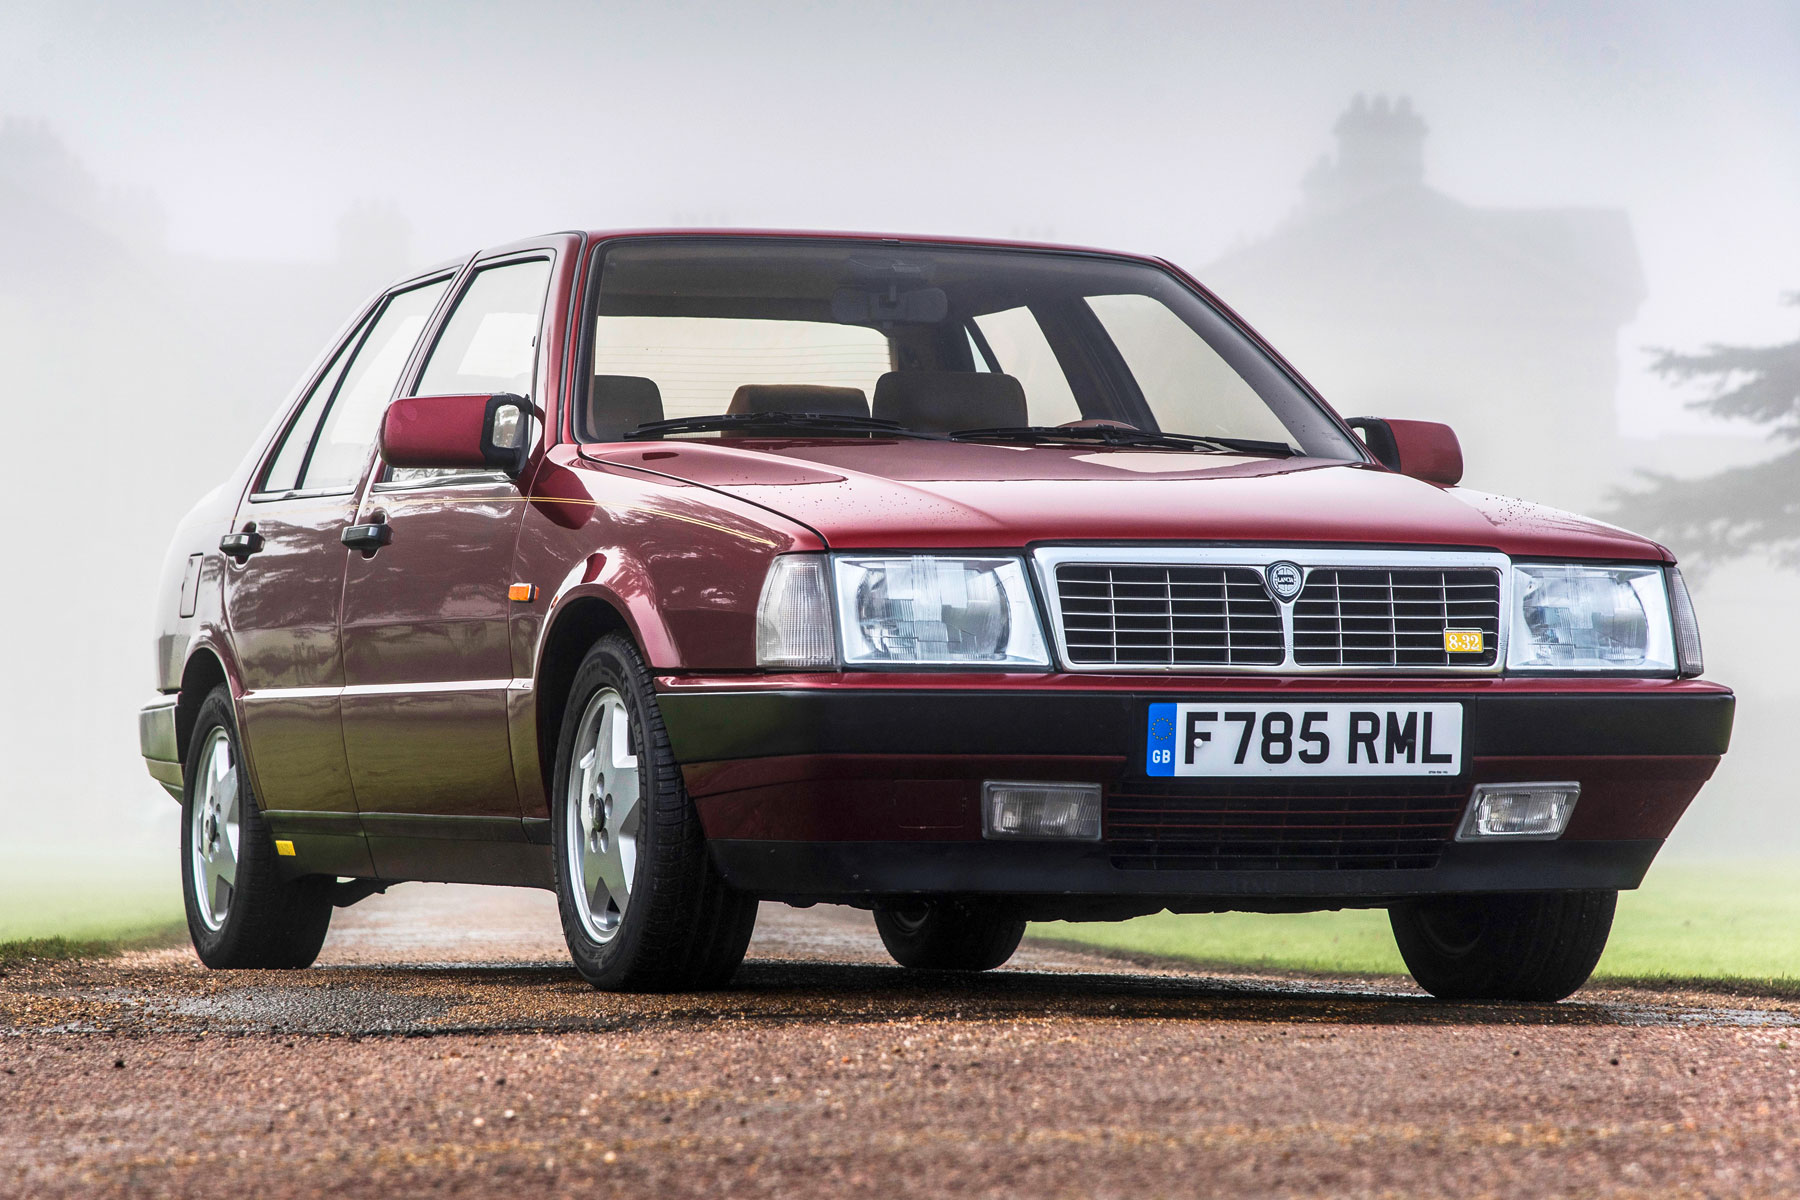 Lancia Thema 8.32 owned by Rowan Atkinson